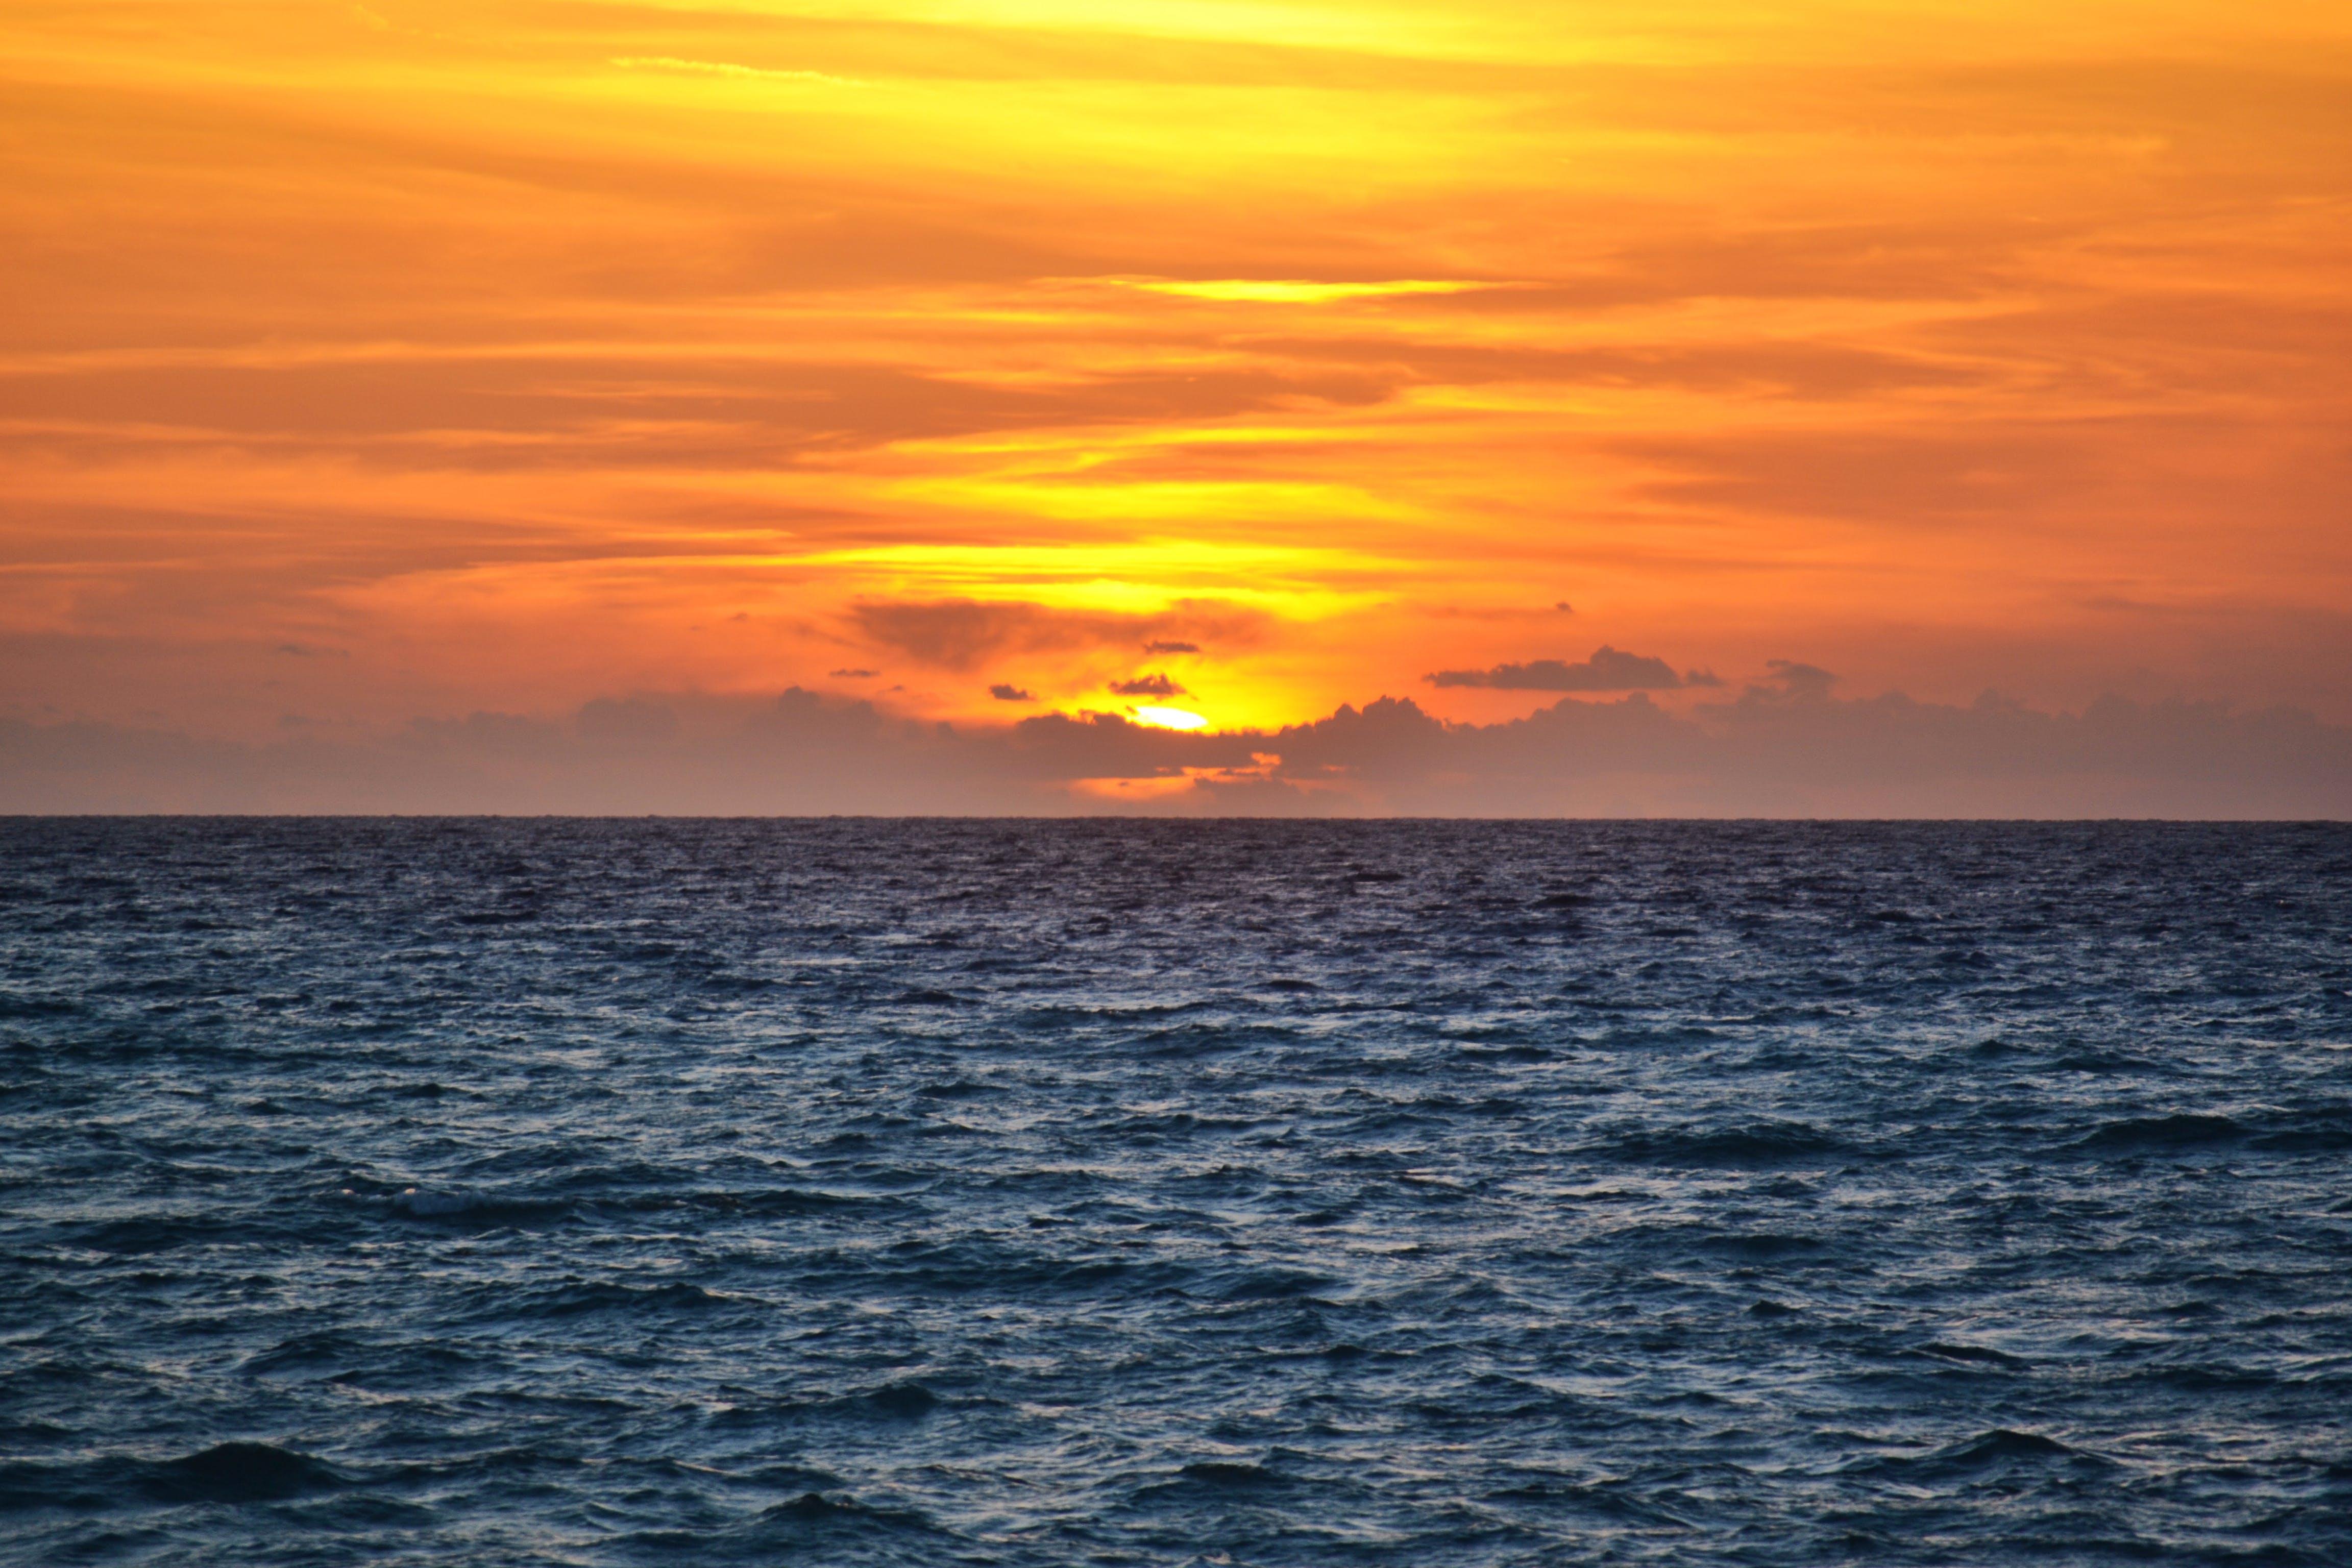 Free stock photo of dawn, dusk, evening, greece